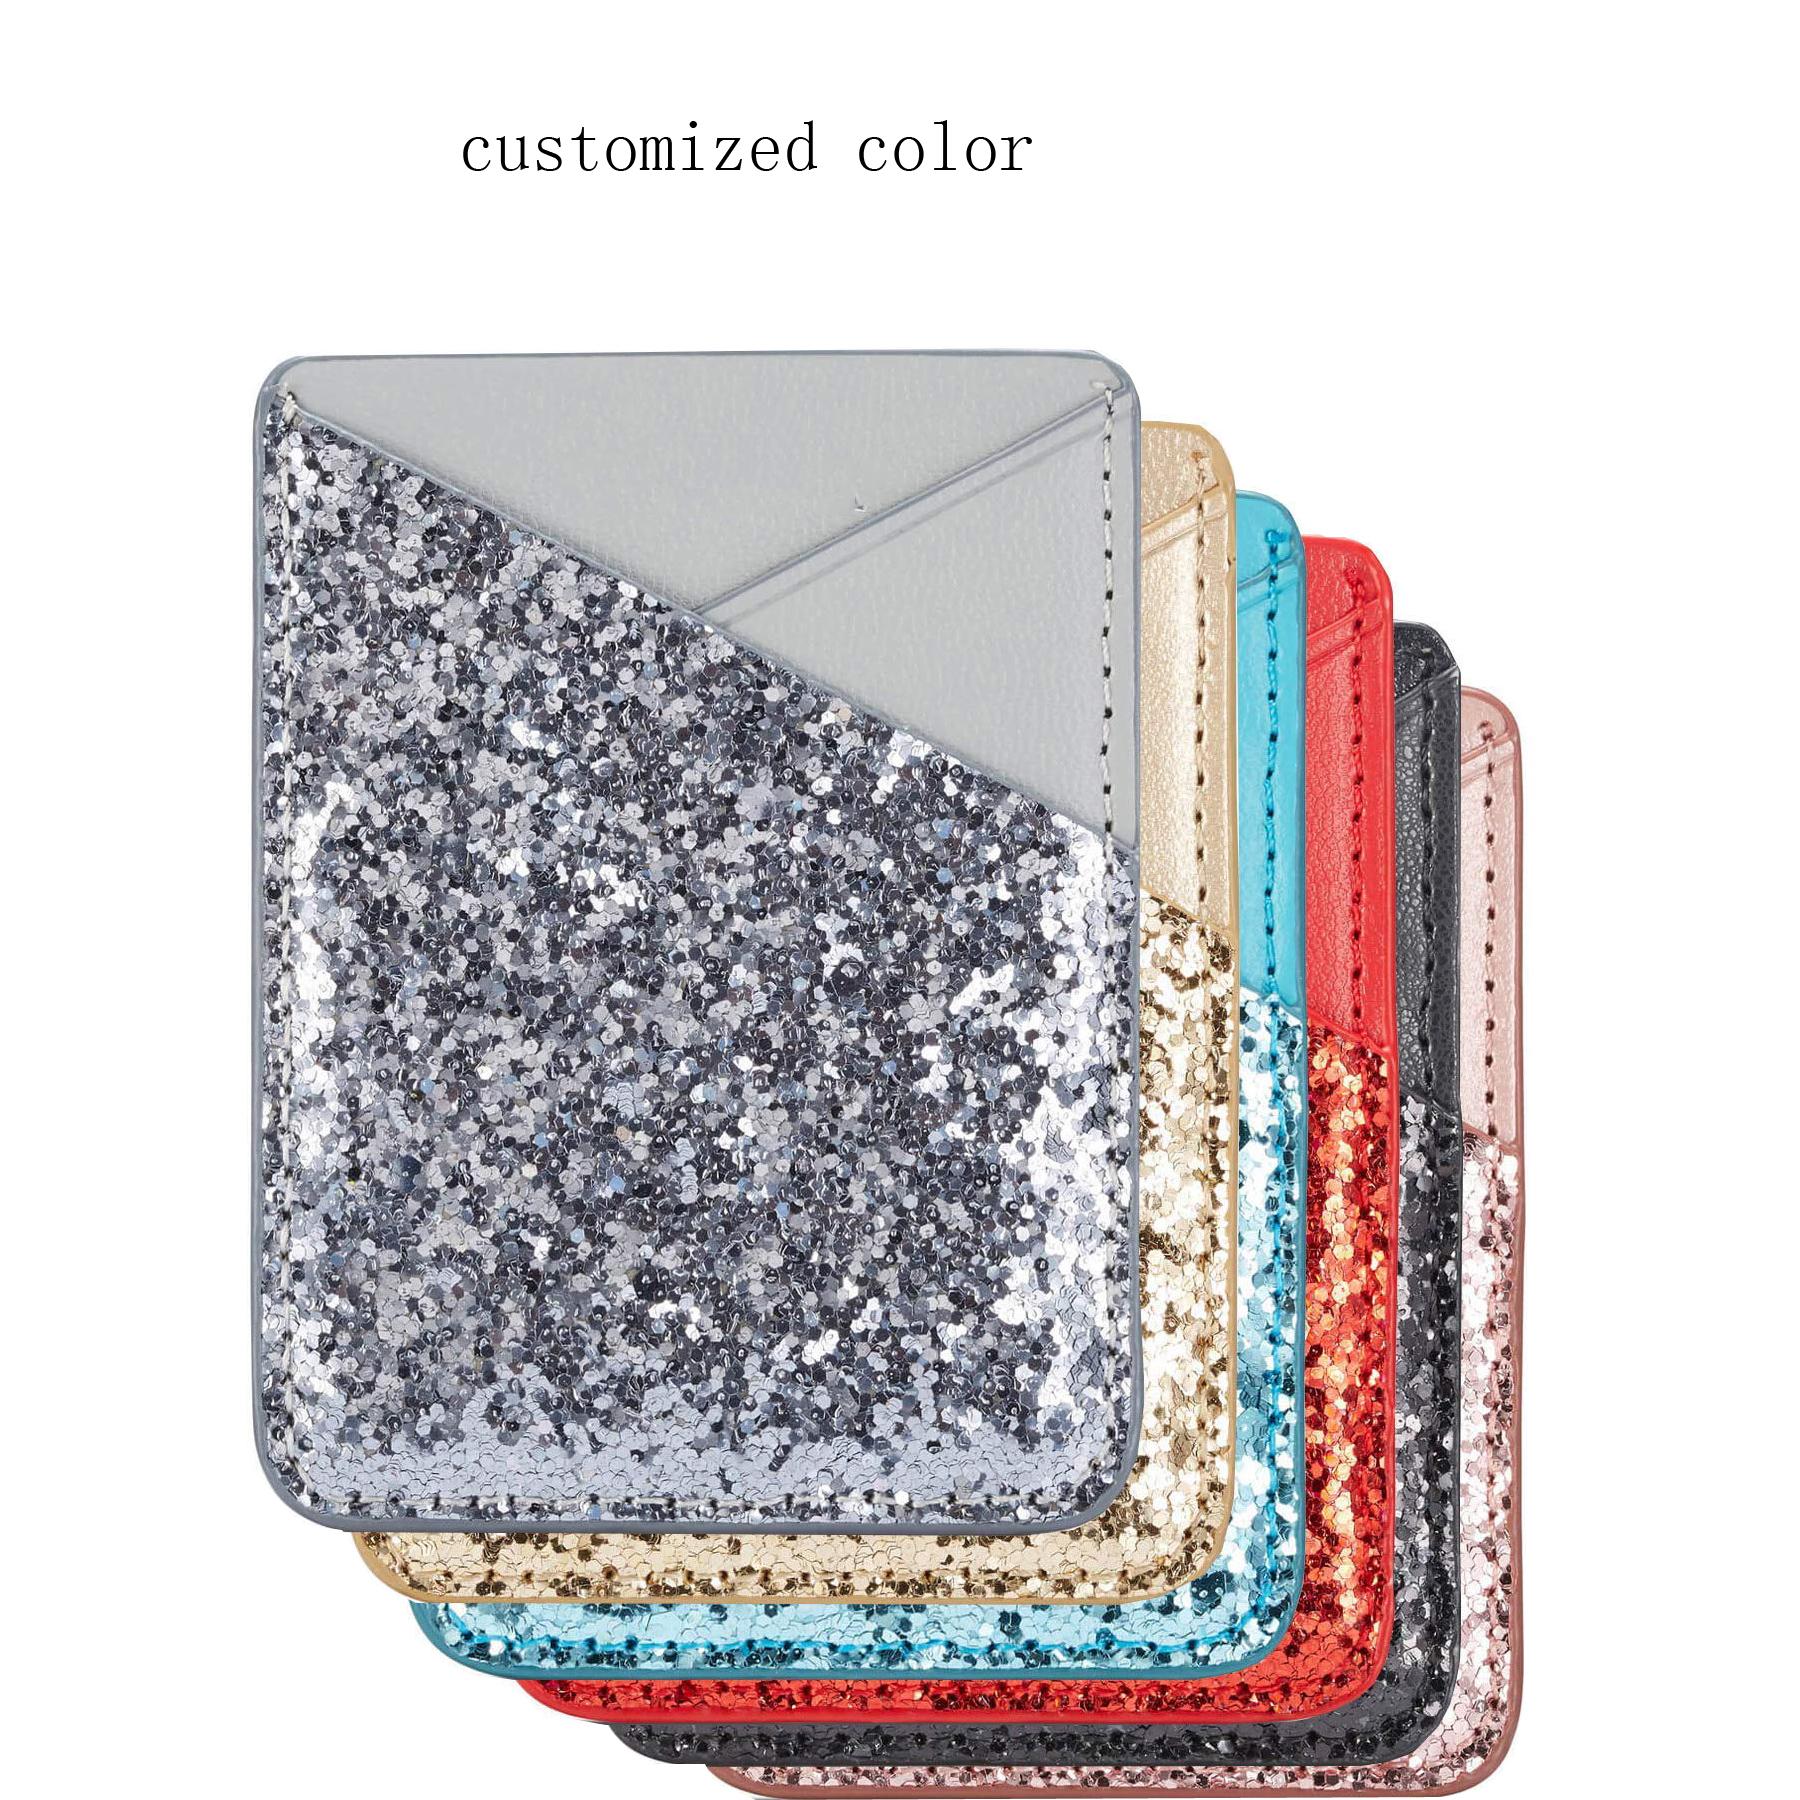 glitter leather pouch.jpg